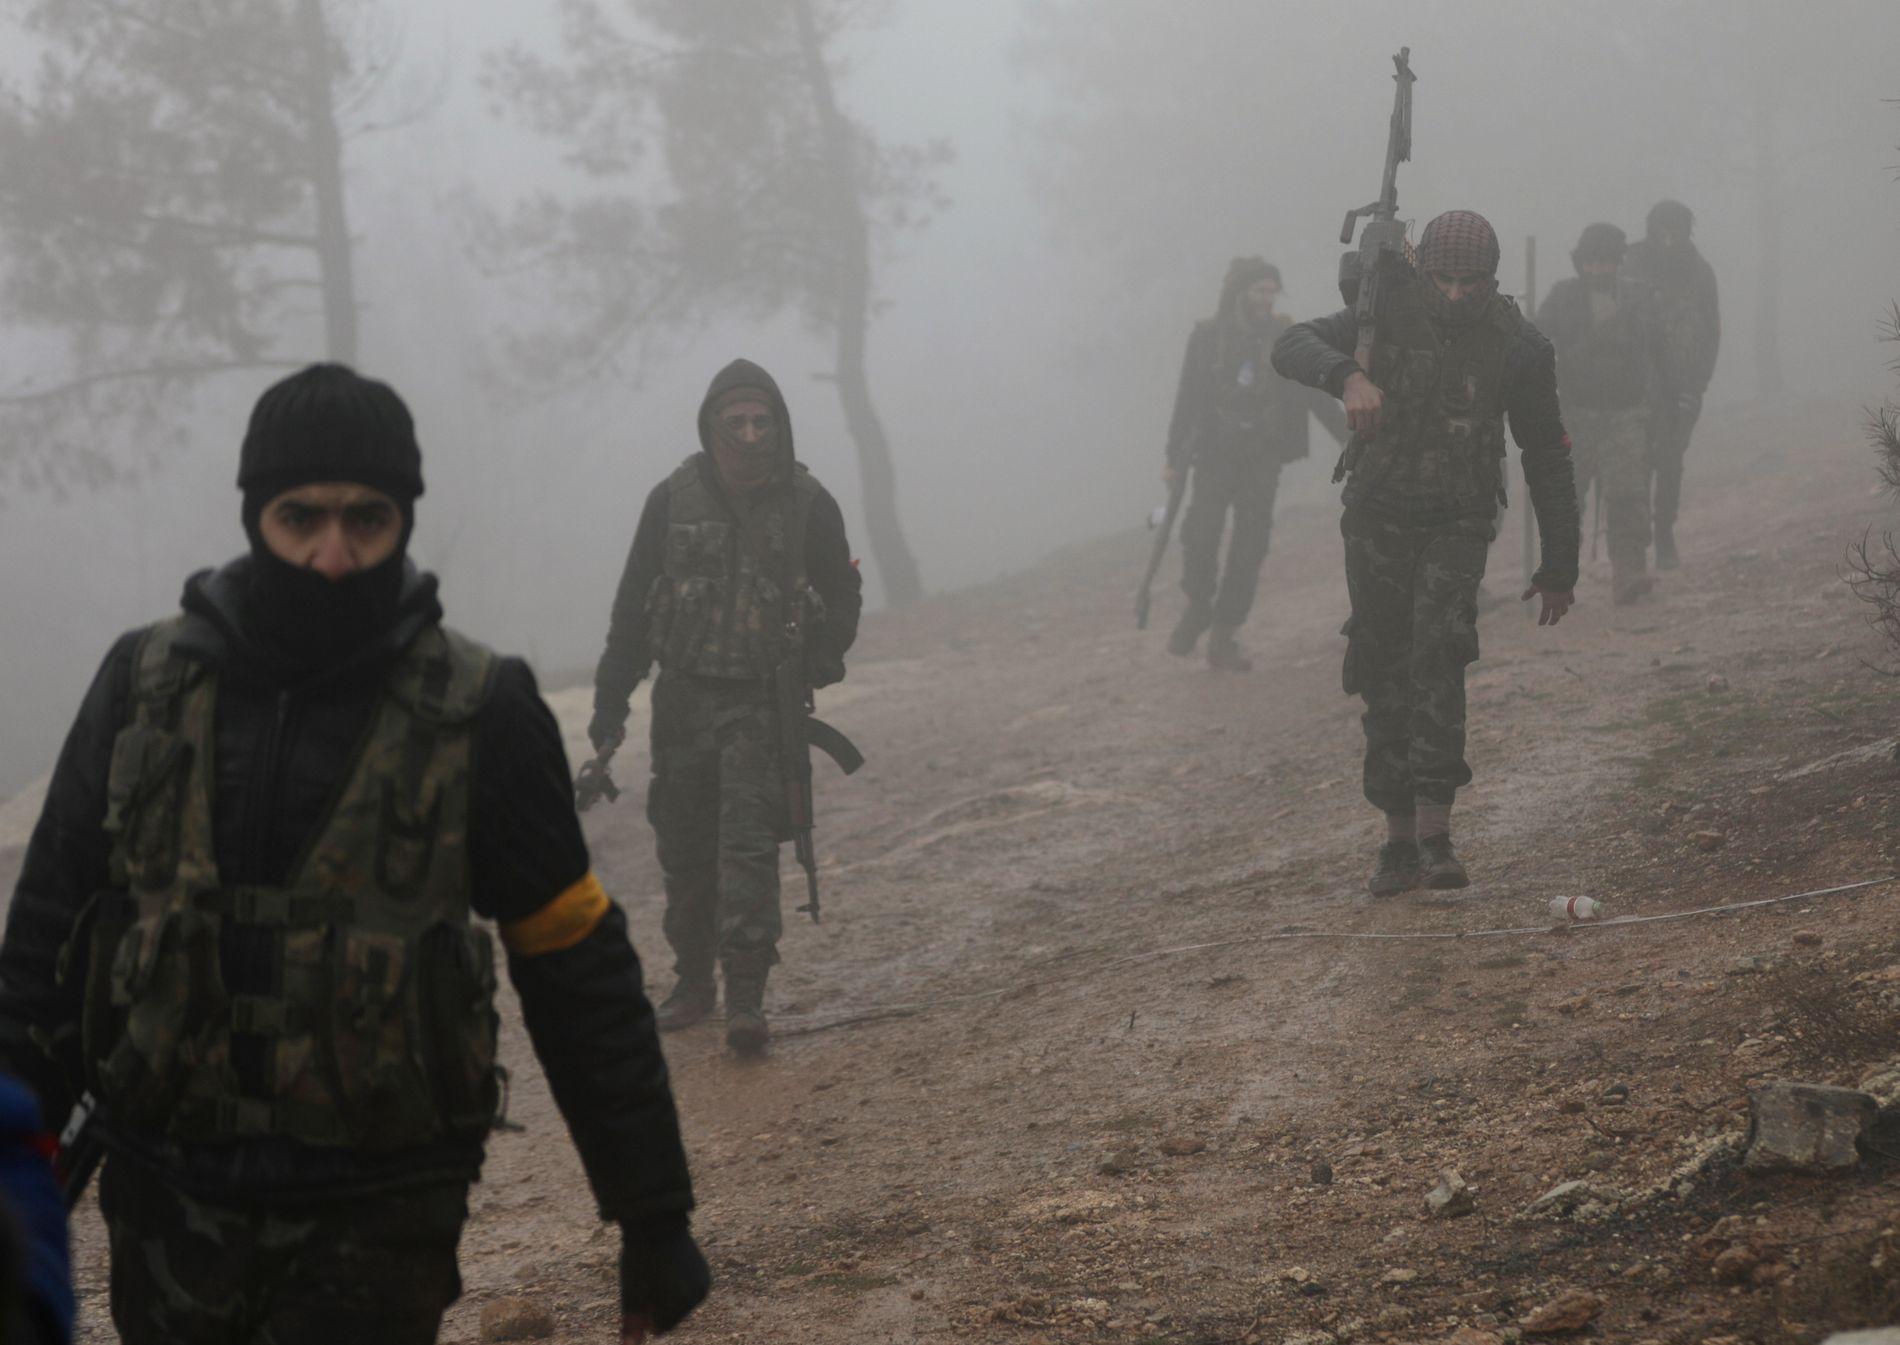 KAMP I TÅKE: Tyrkisk-støttede syriske opprørere i Den frie syriske hær nær Barsaya-fjellet tirsdag denne uken.